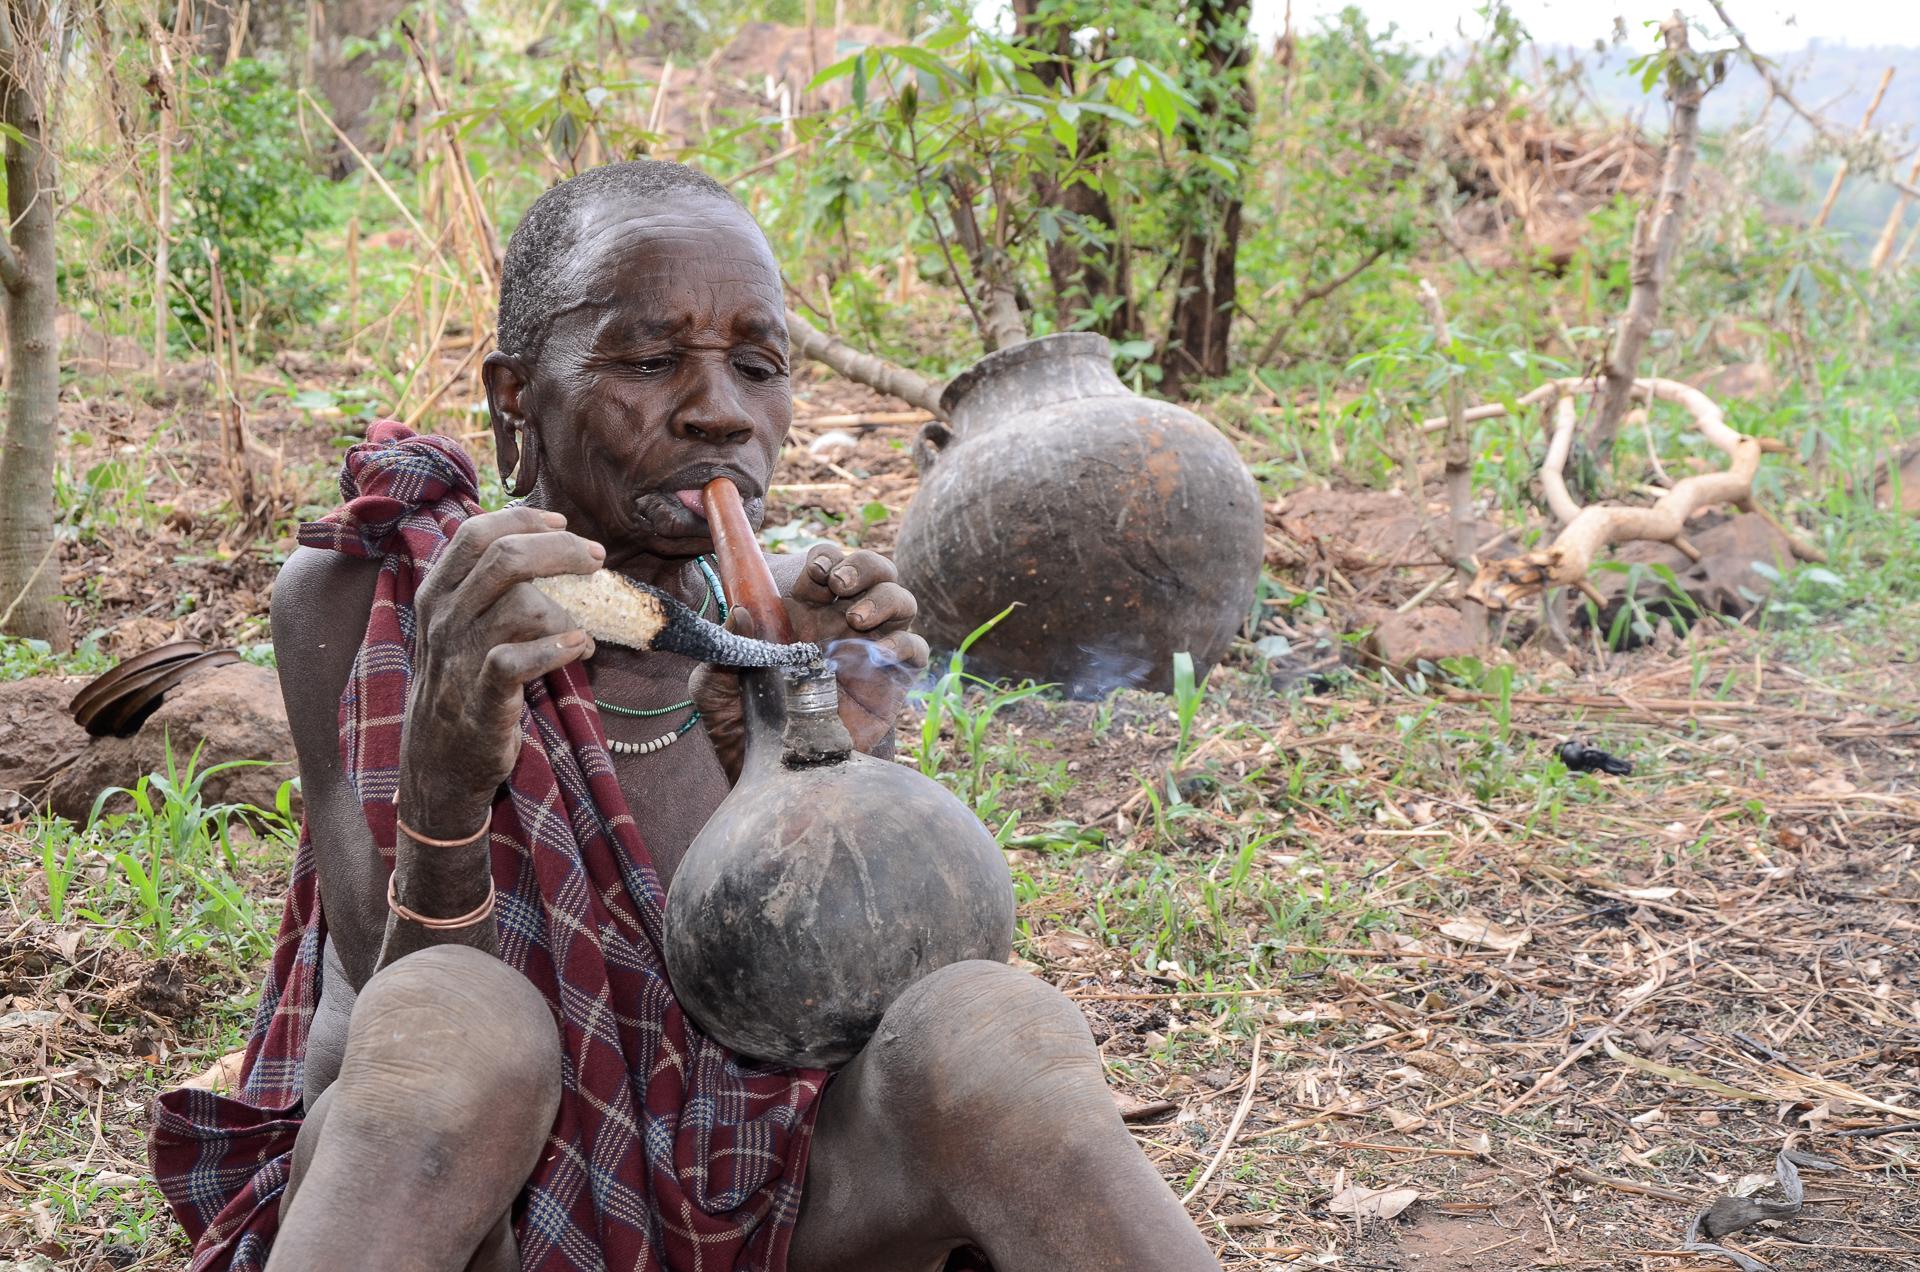 Région Surma Ethiopie - femme